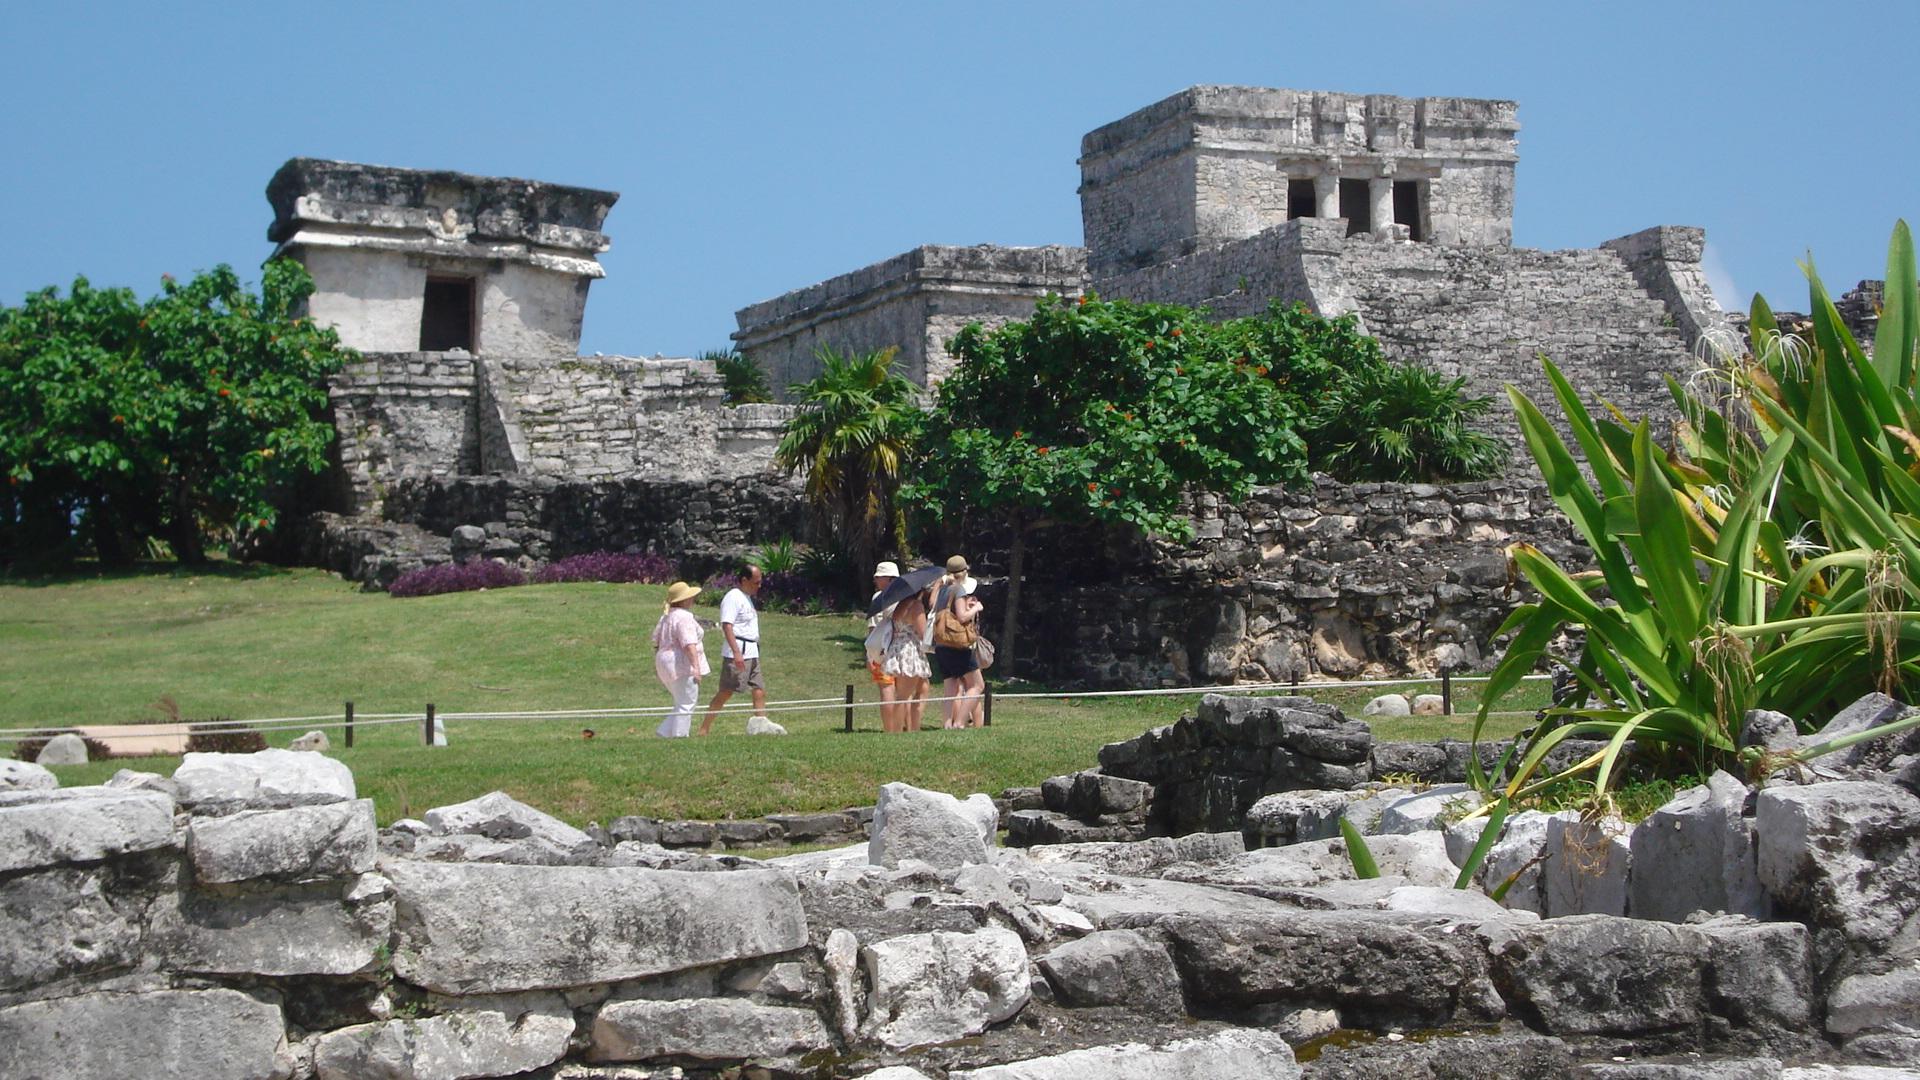 File:Ruinas mayas de tulum.JPG - Wikimedia Commons